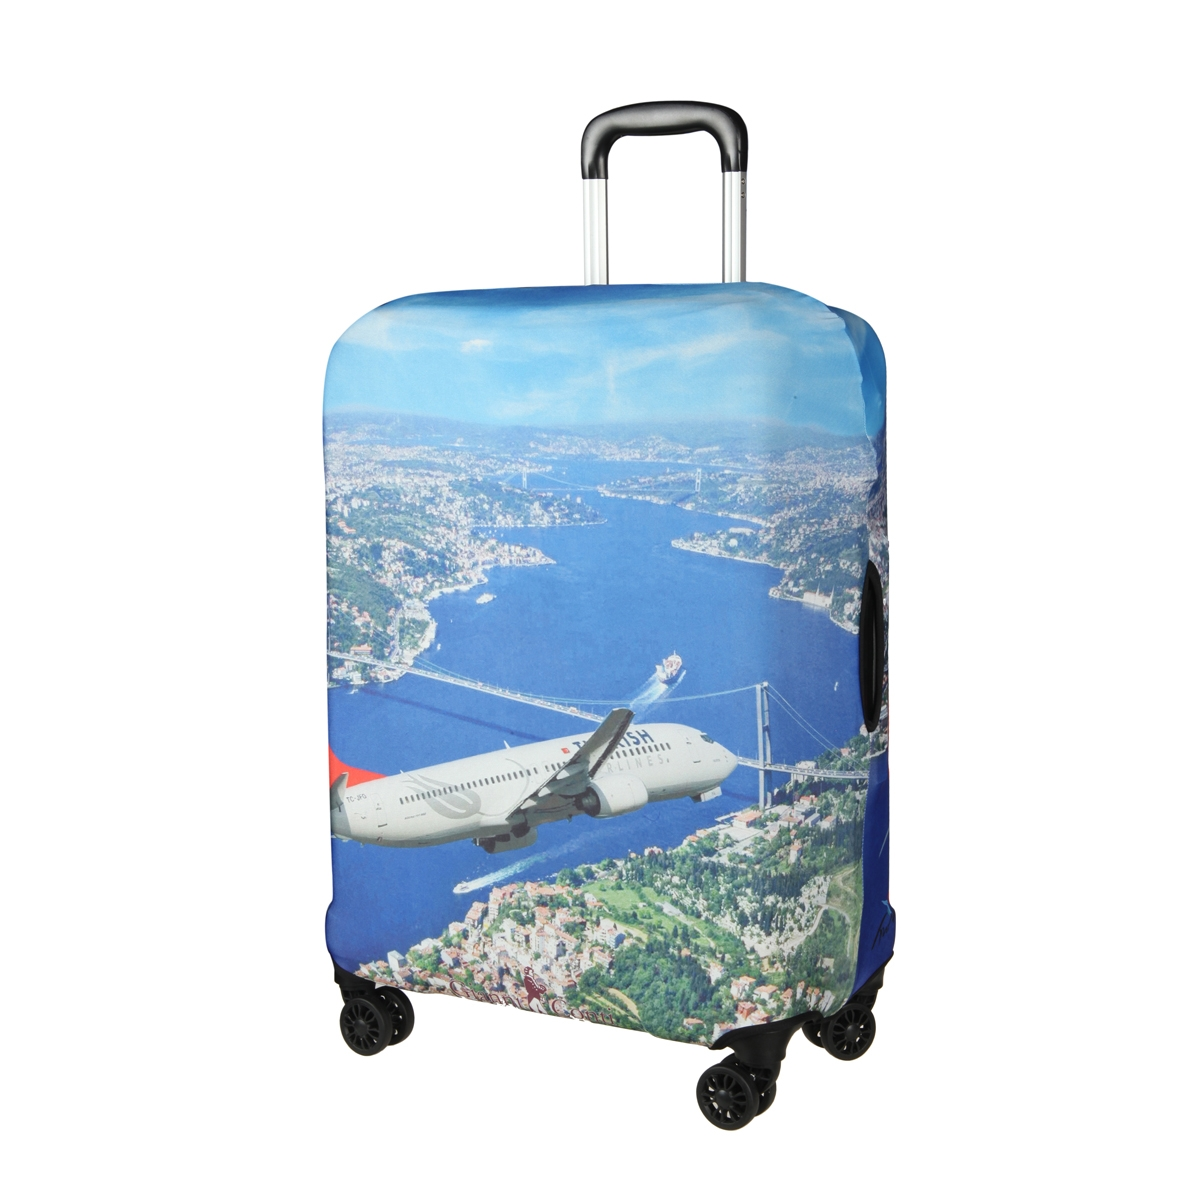 Защитное покрытие для чемодана Gianni Conti 9047 S.